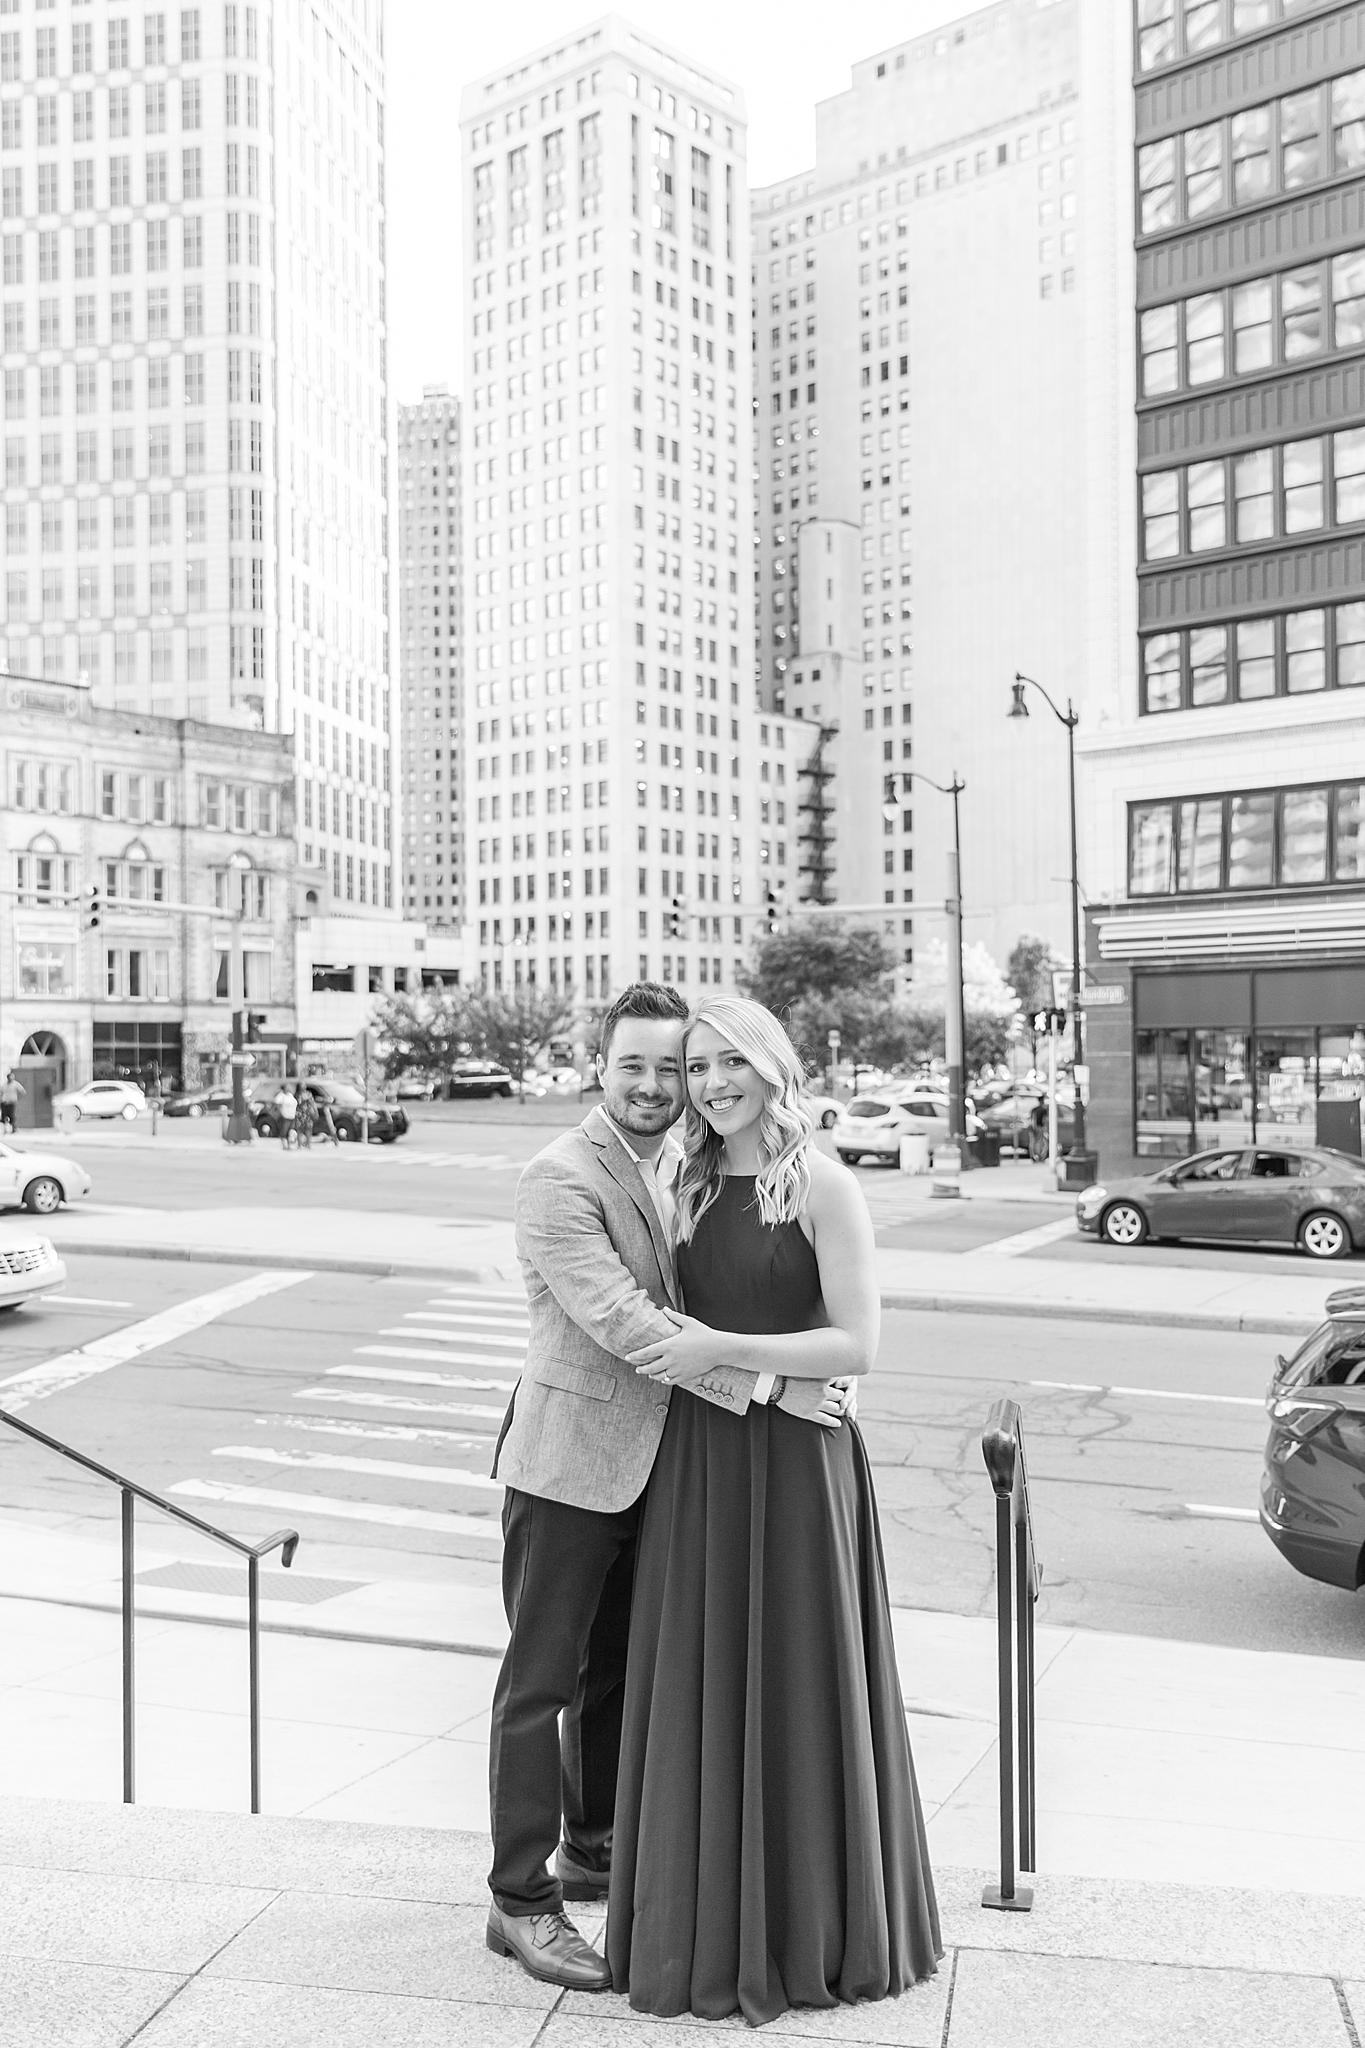 detroit-wedding-photographer-downtown-detroit-belle-isle-engagement-photos-sarah-eric-by-courtney-carolyn-photography_0033.jpg